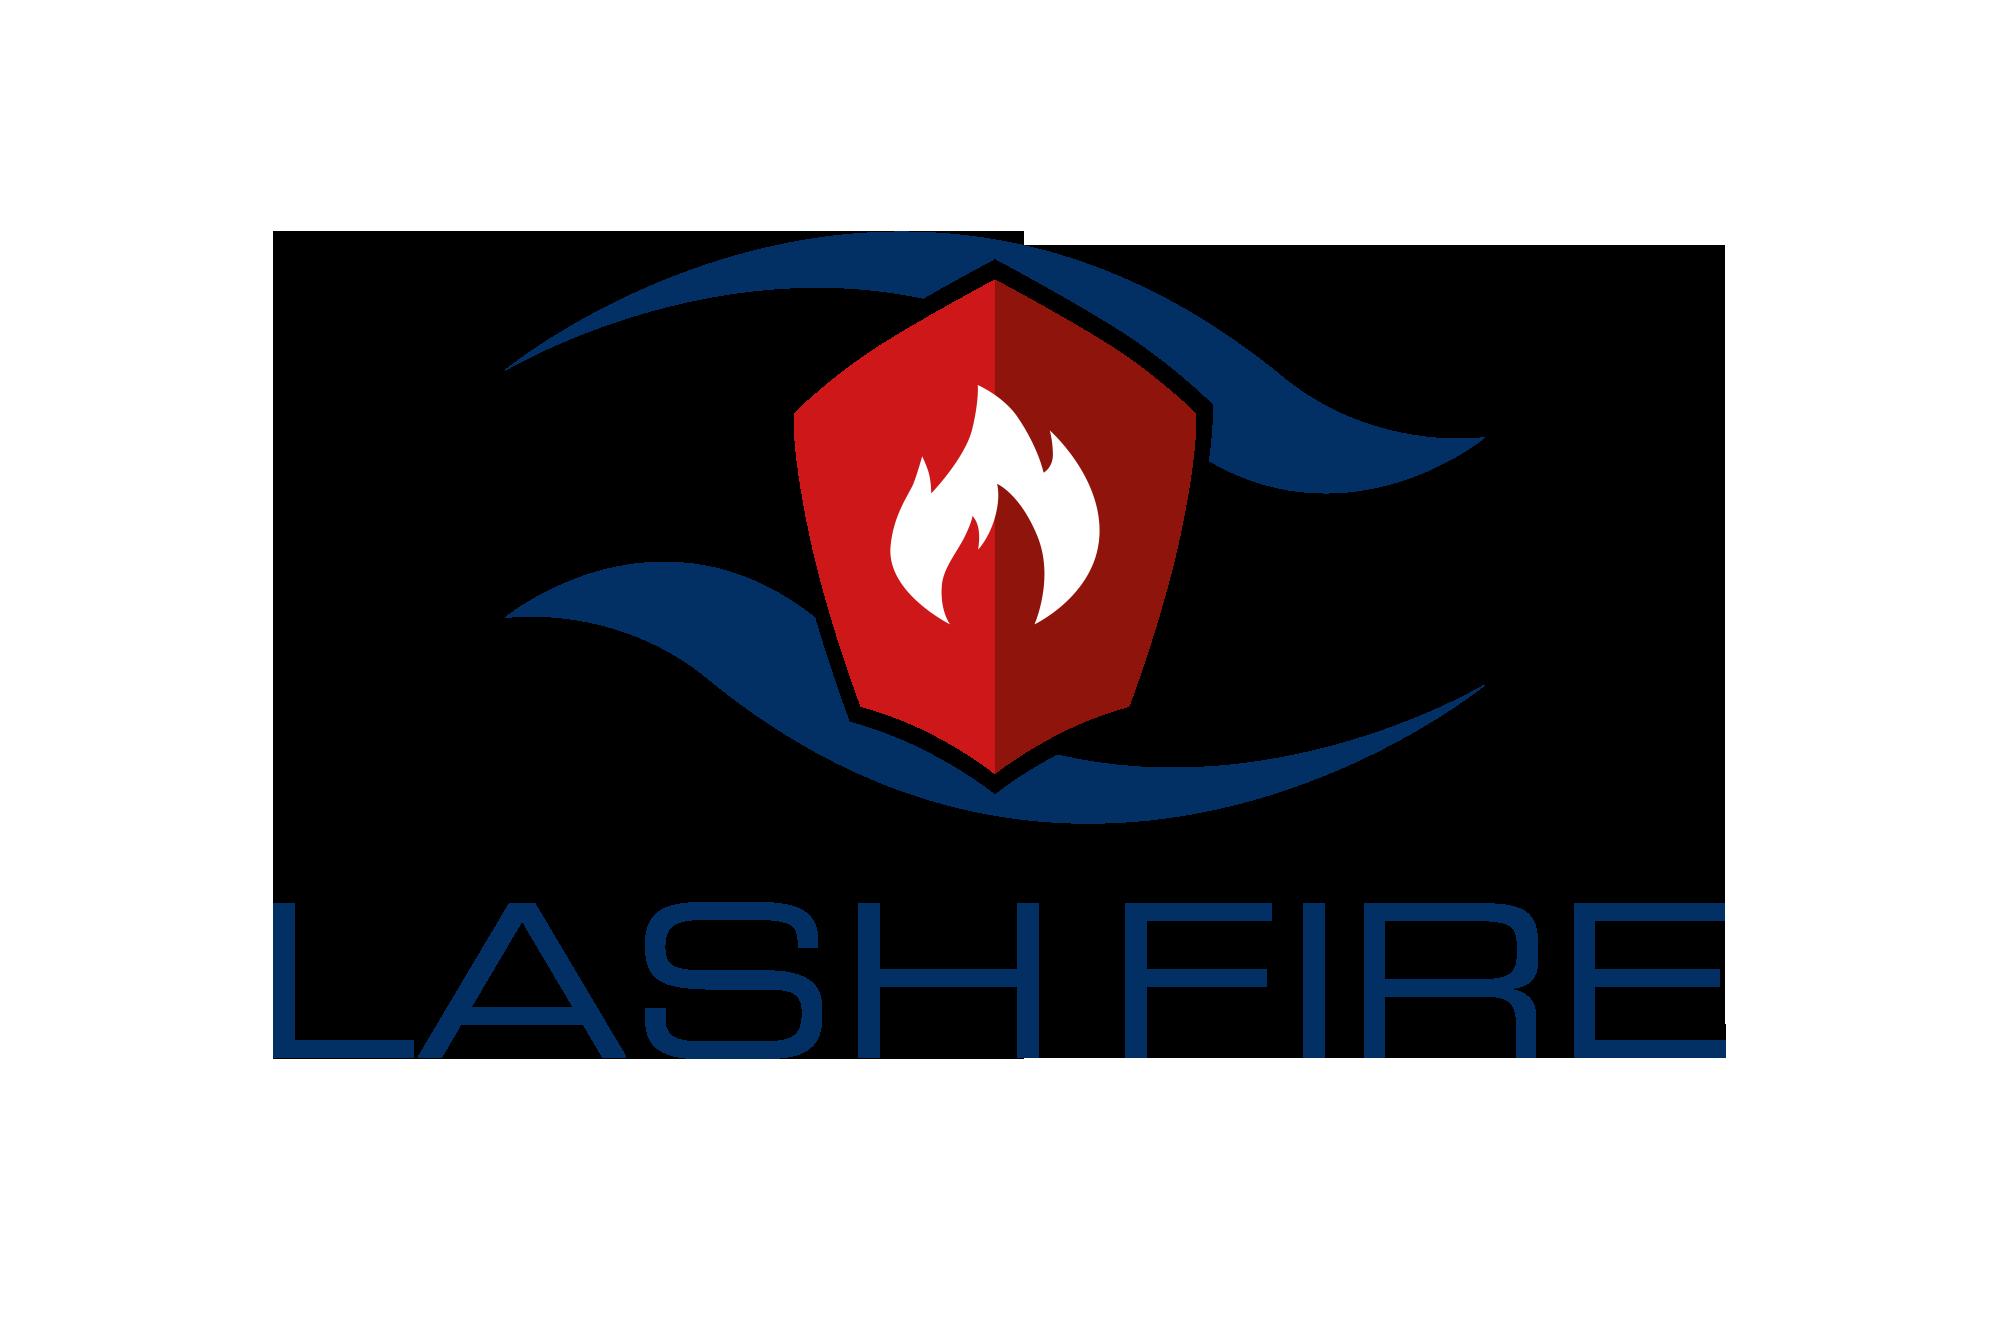 lashfire.eu